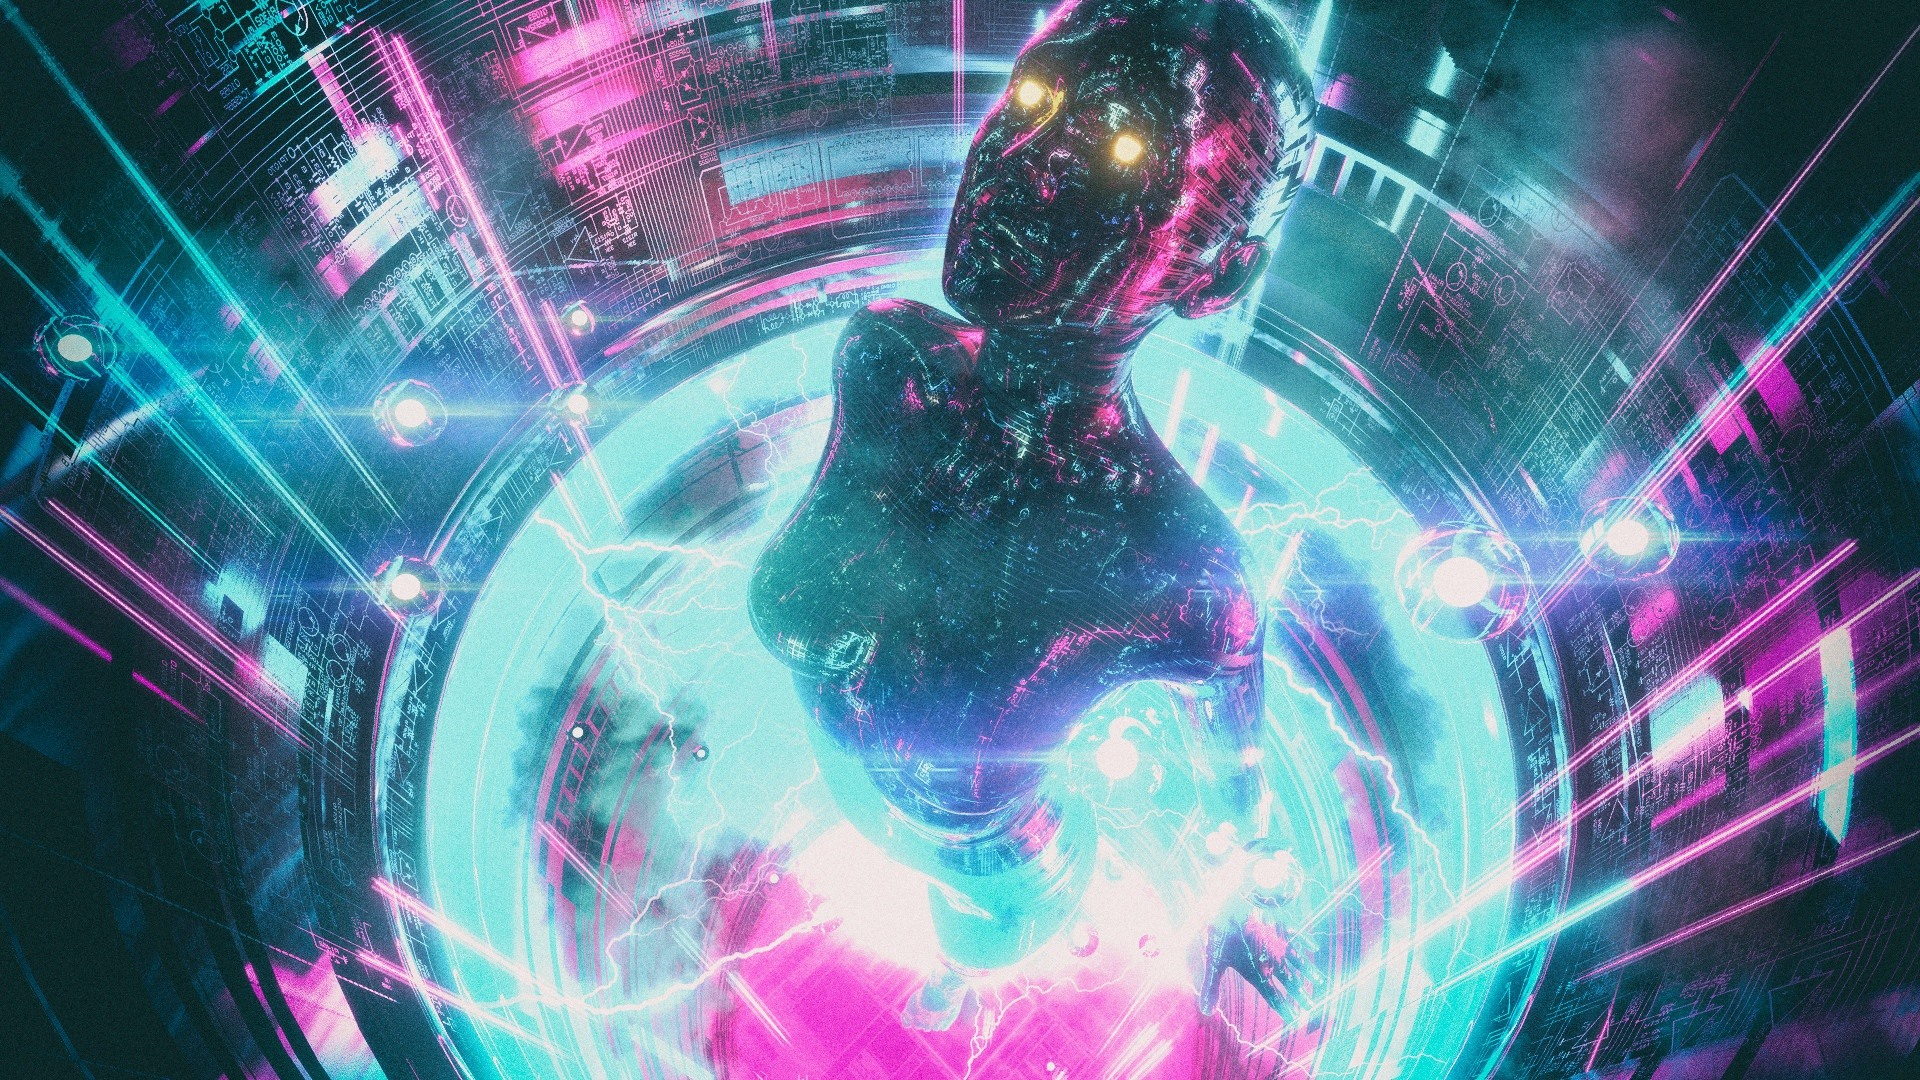 Cyberpunk 2077 Wallpapers Hd: Wallpaper Cyberpunk 2077, Girl, Neon 1920x1080 Full HD 2K